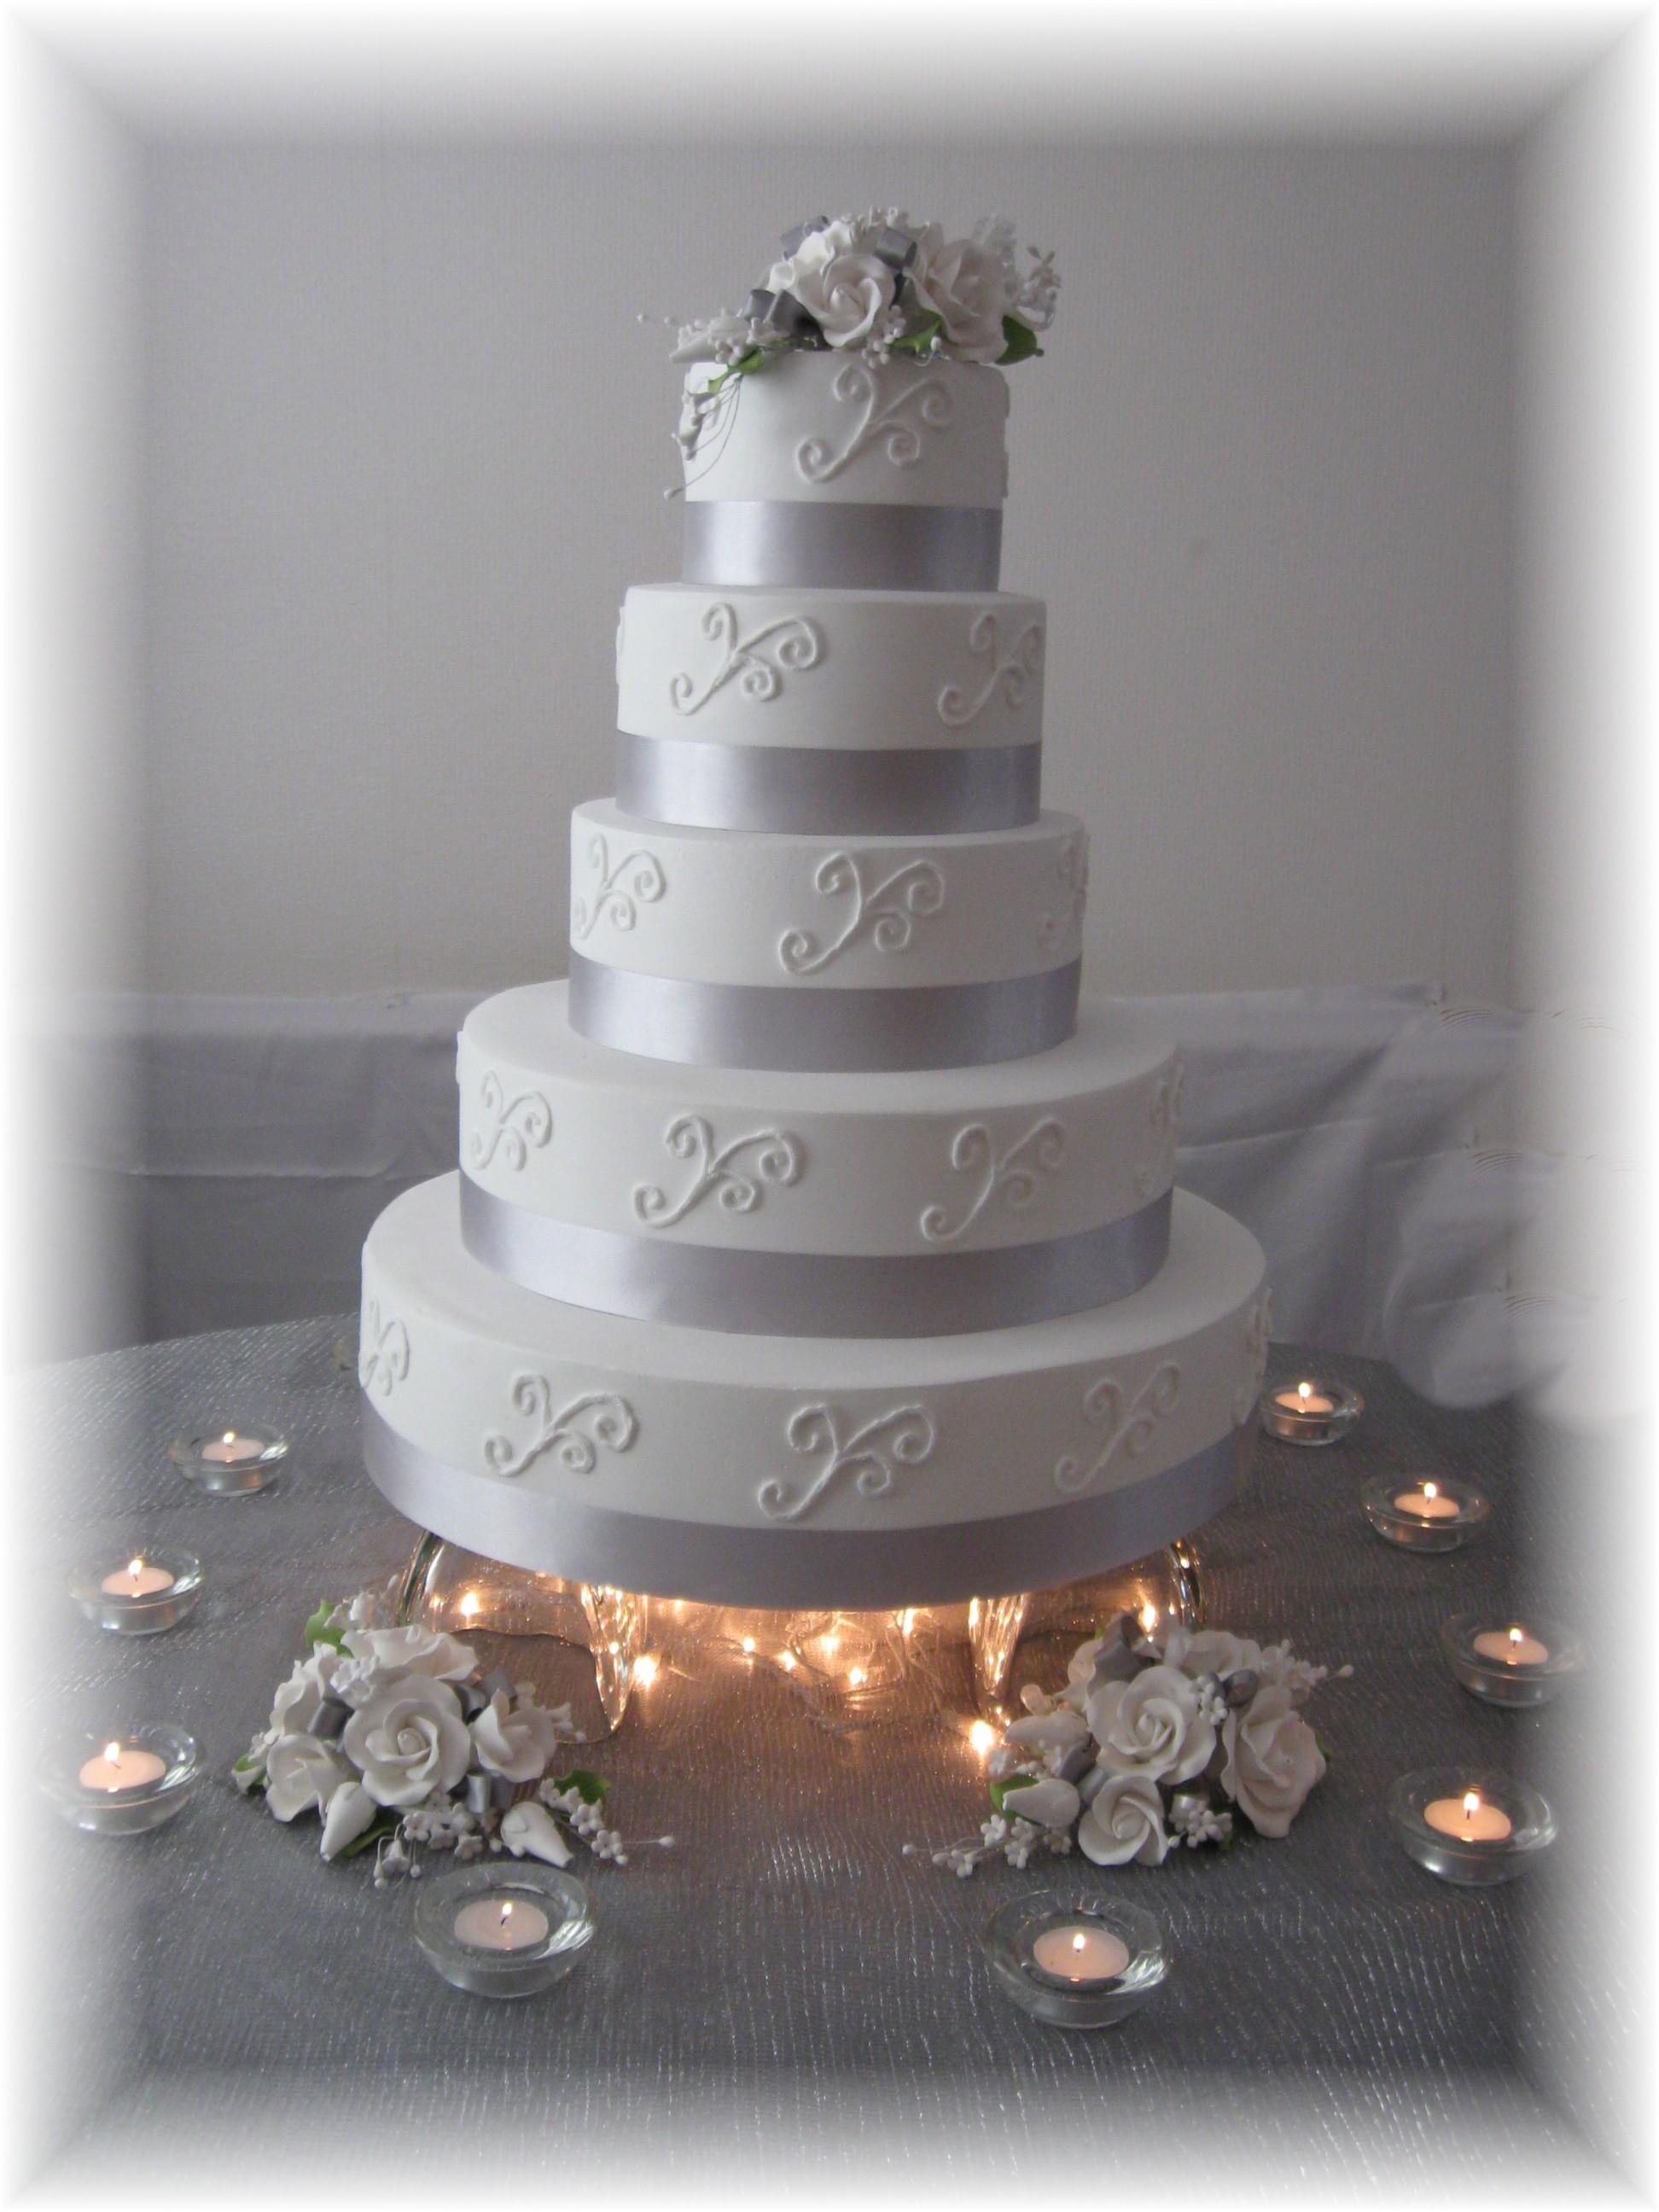 wedding cakes with silver ribbon fake wedding cakes Cakes Silver Cake Wedding Anniversary Fake 25th Afakecake